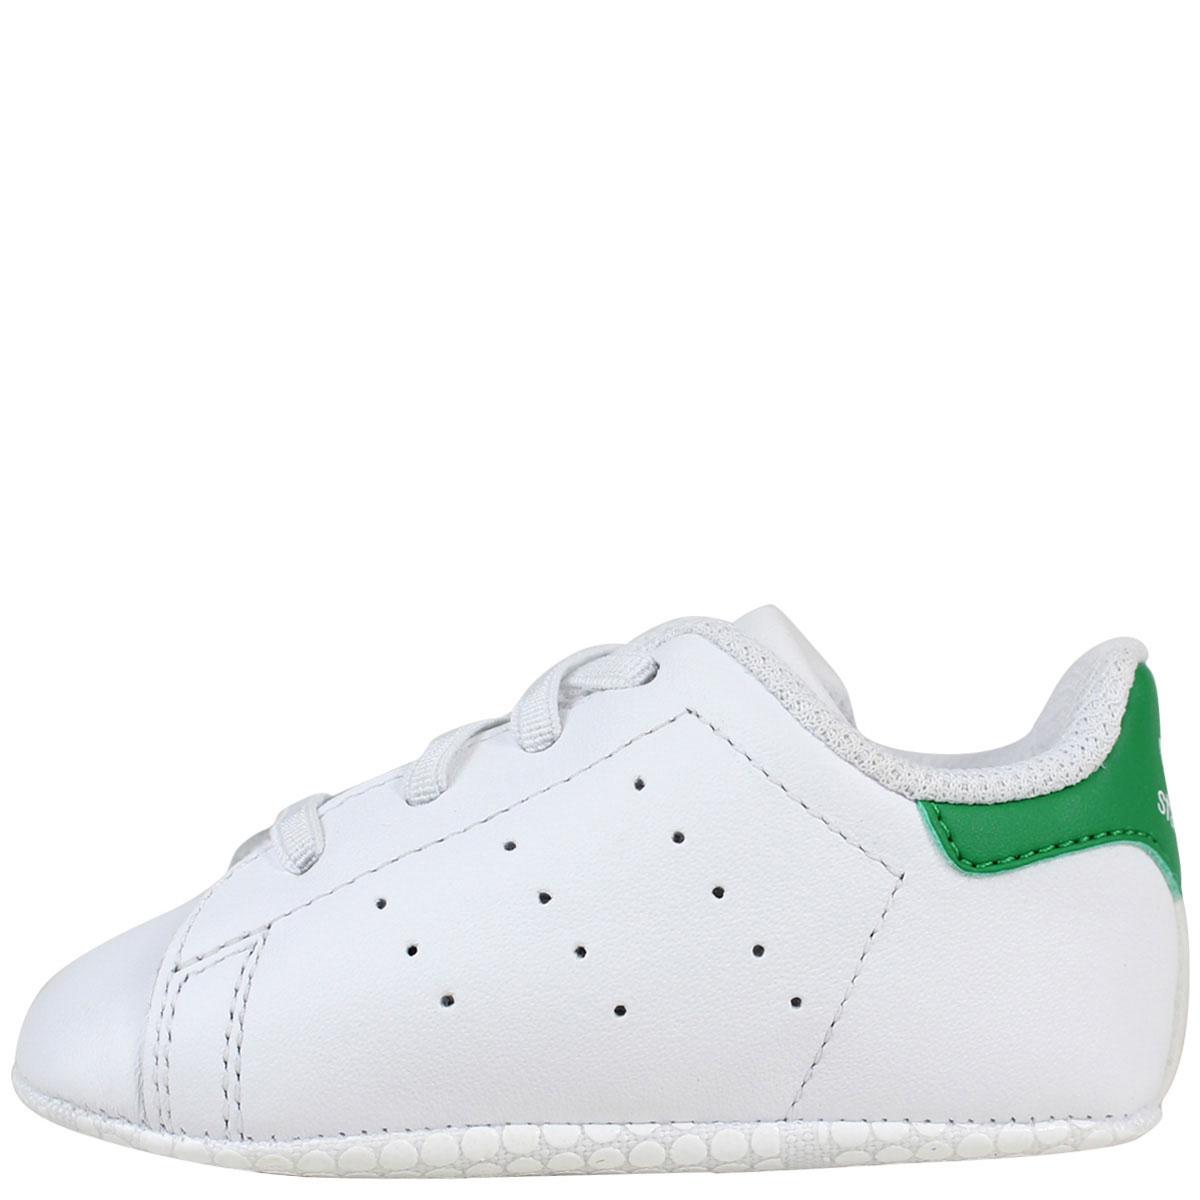 adidas Originals STAN SMITH CRIB スタンスミス キッズ ベビー アディダス オリジナルス スニーカー 靴 B24101 ホワイト [8/14 追加入荷] [188]